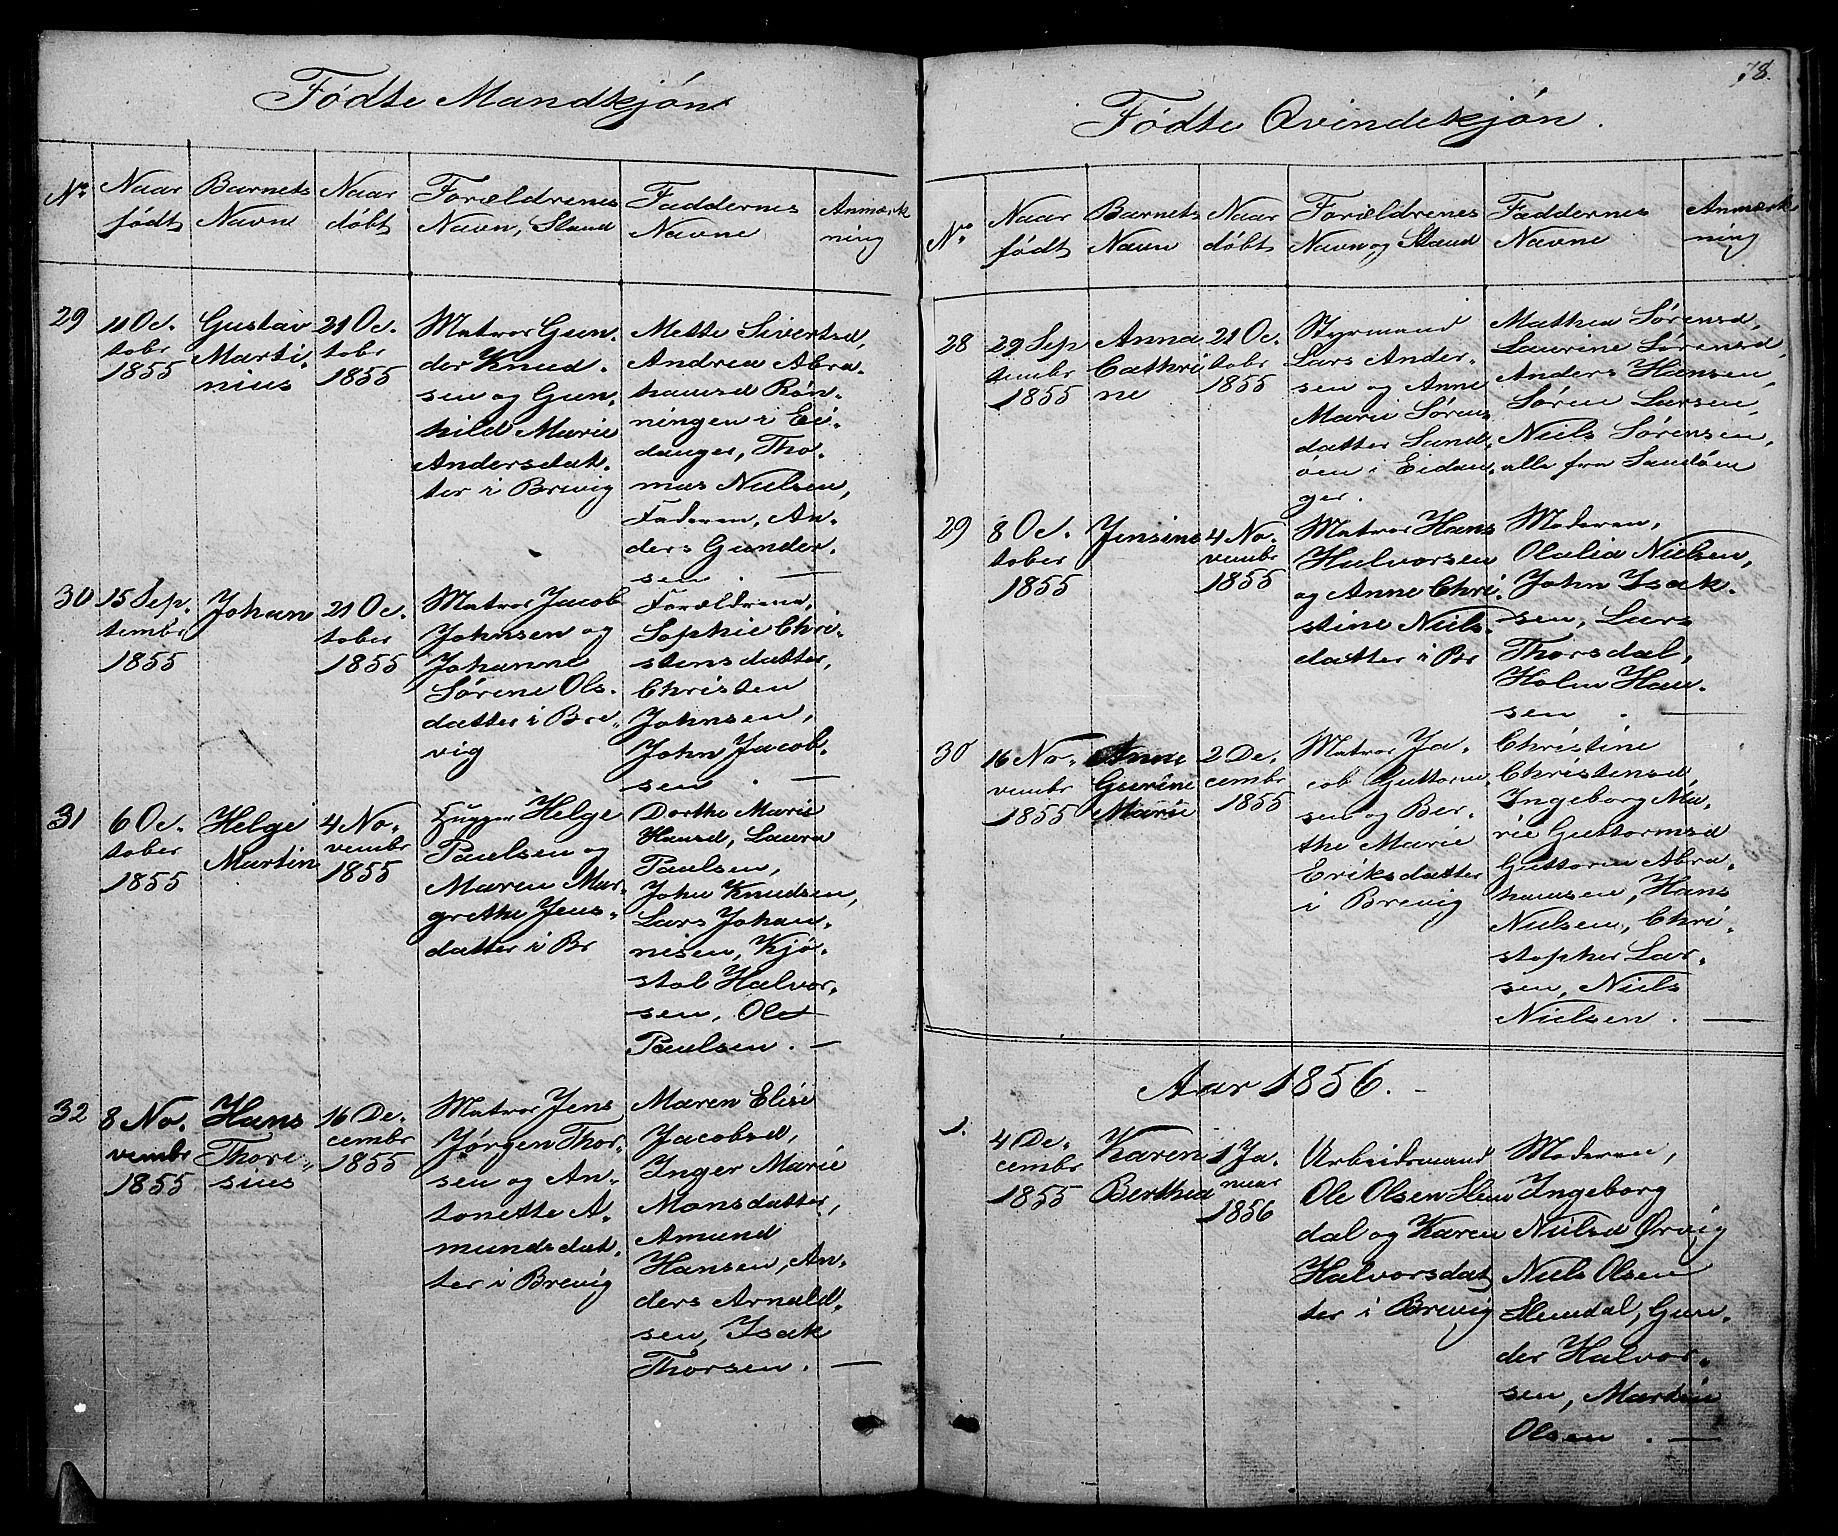 SAKO, Brevik kirkebøker, G/Ga/L0002: Klokkerbok nr. 2, 1846-1865, s. 78